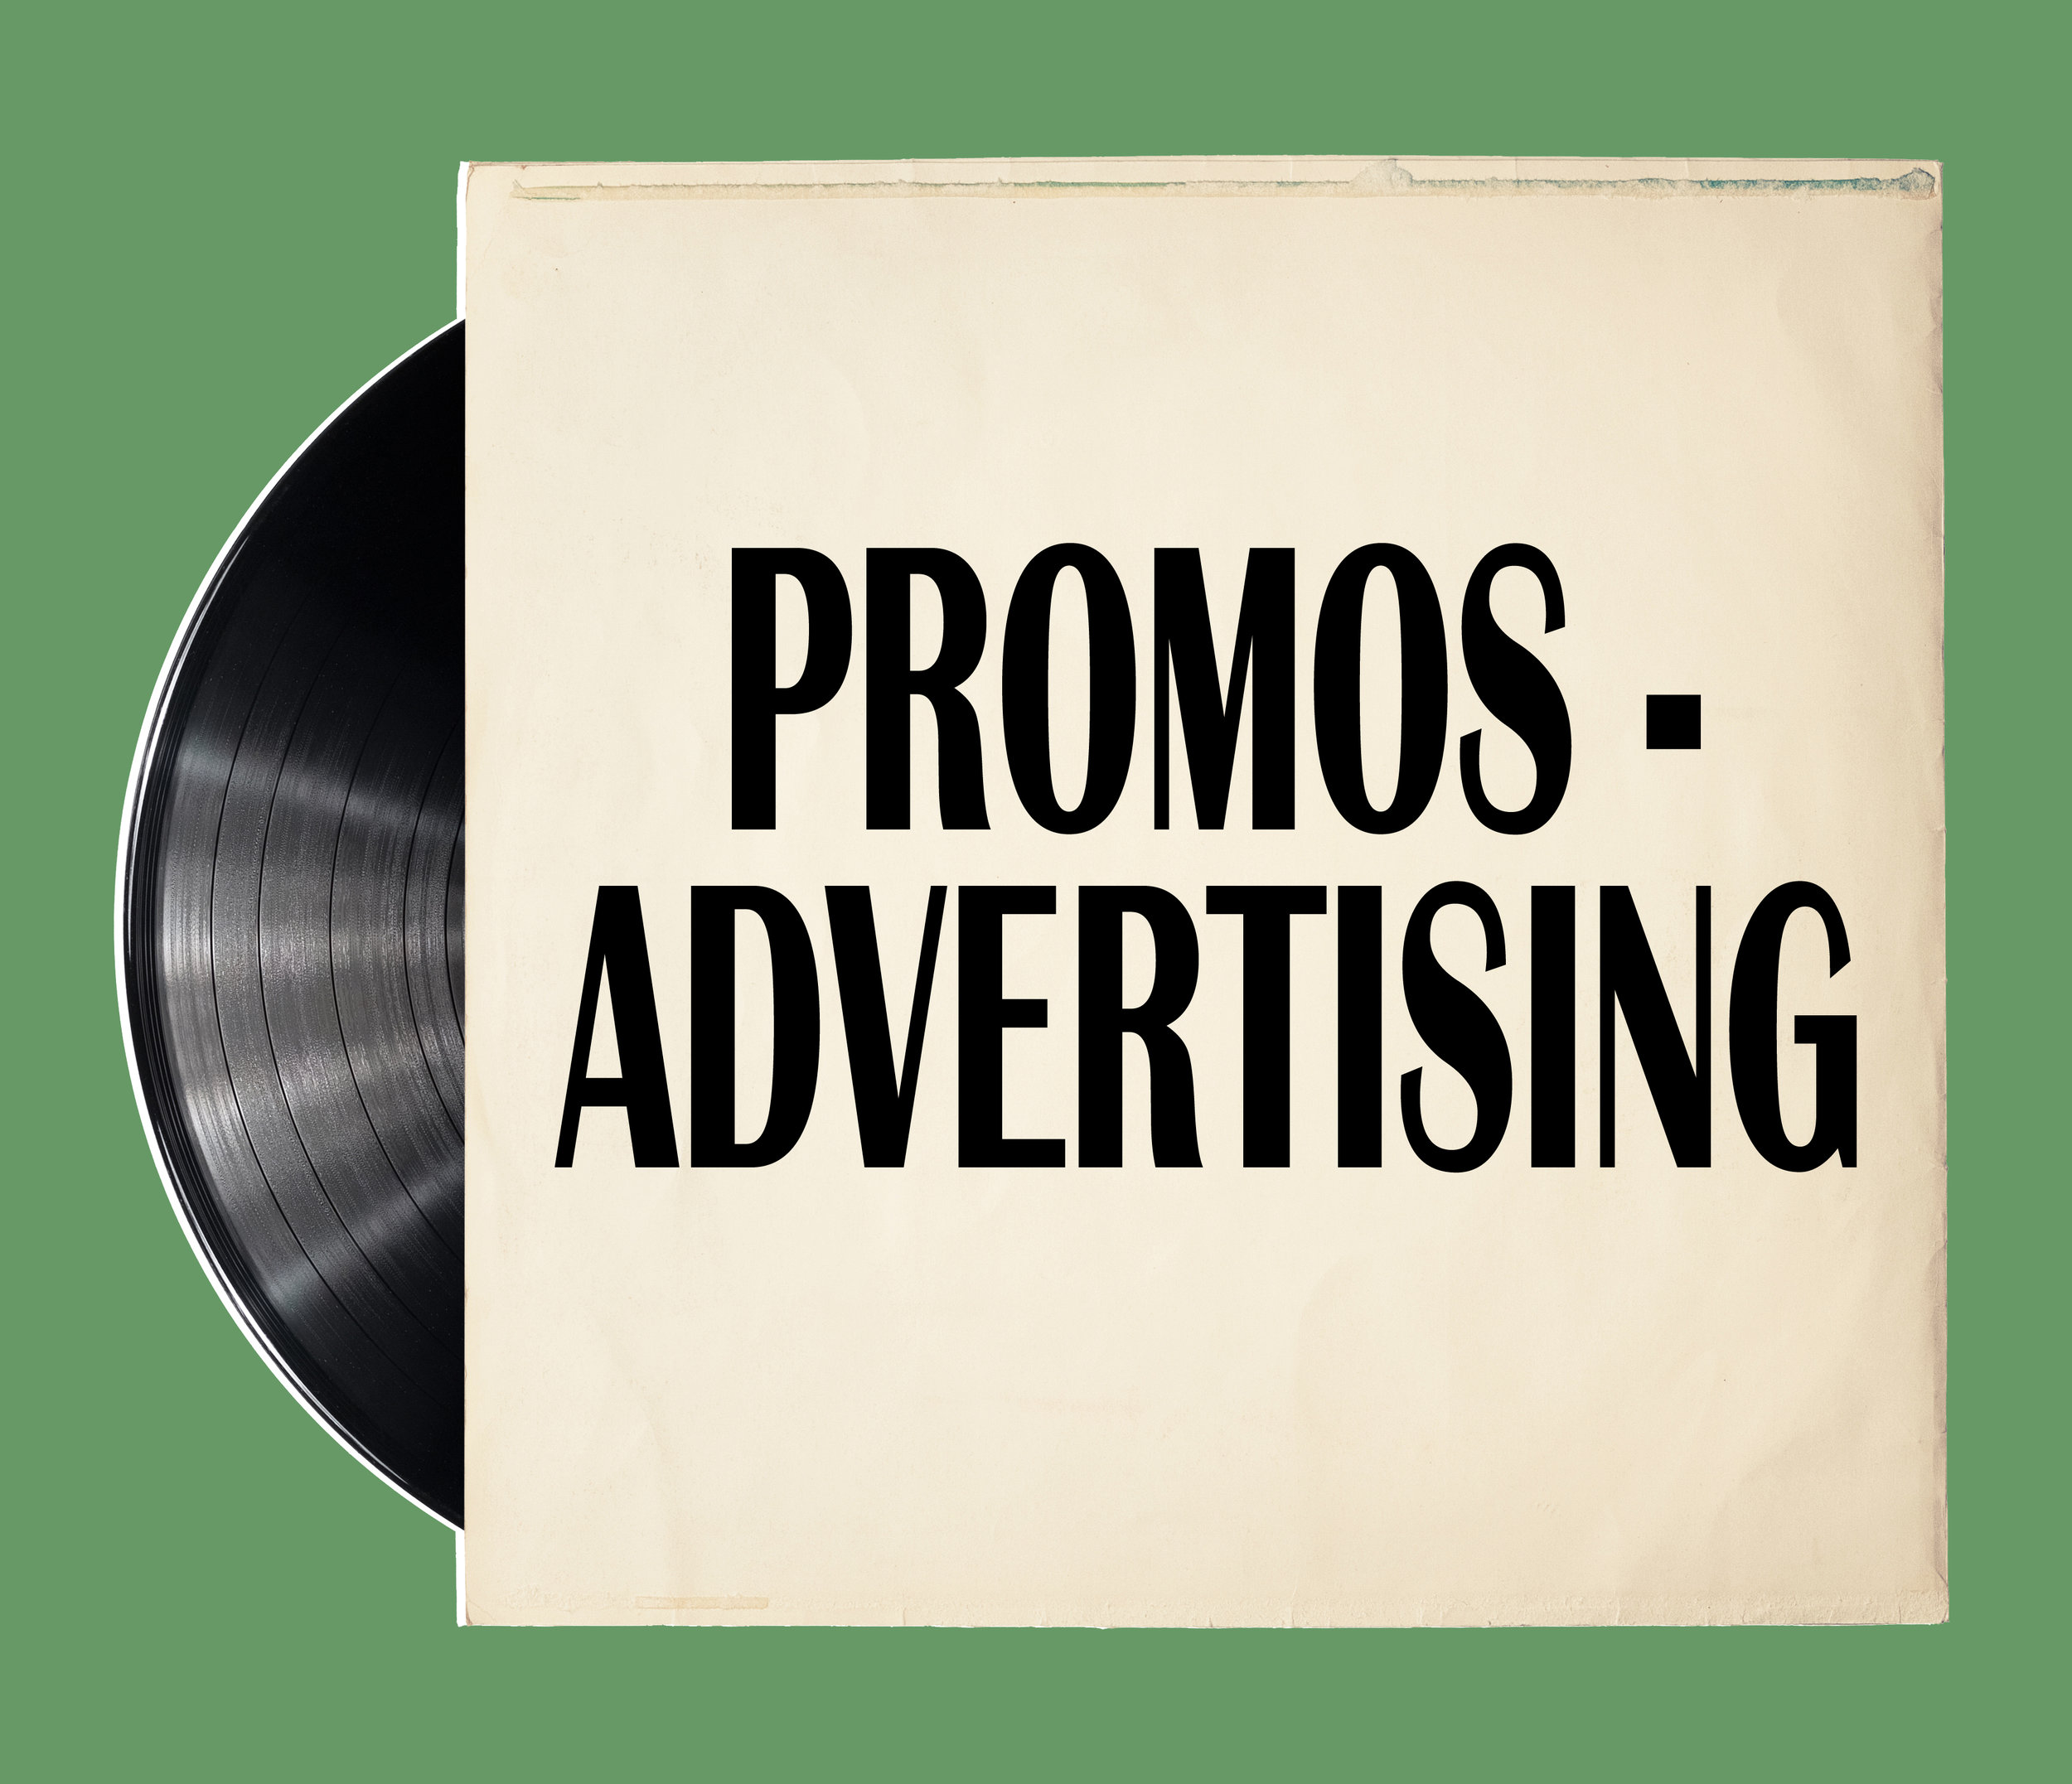 Promos - Advertising